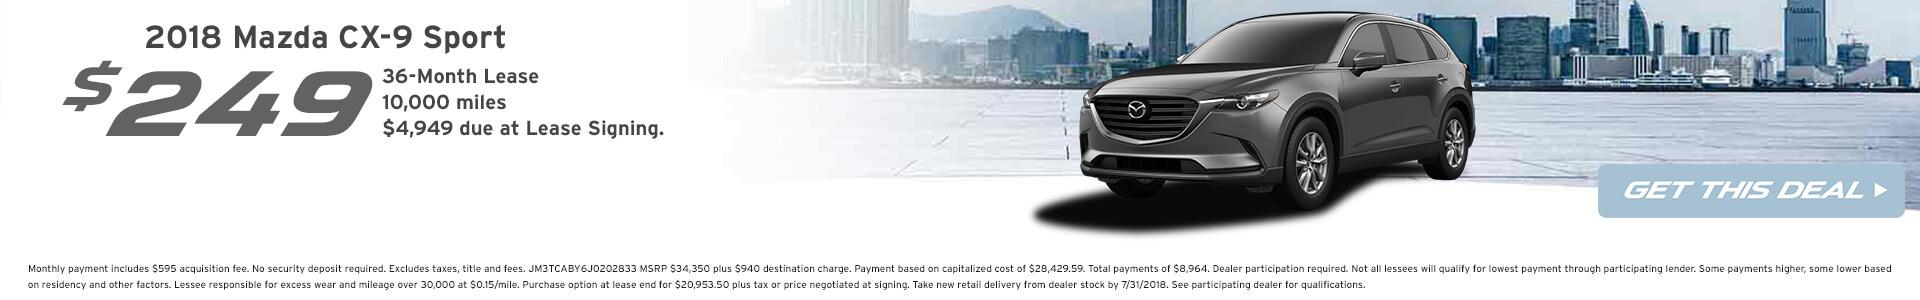 CX-9 Lease $249